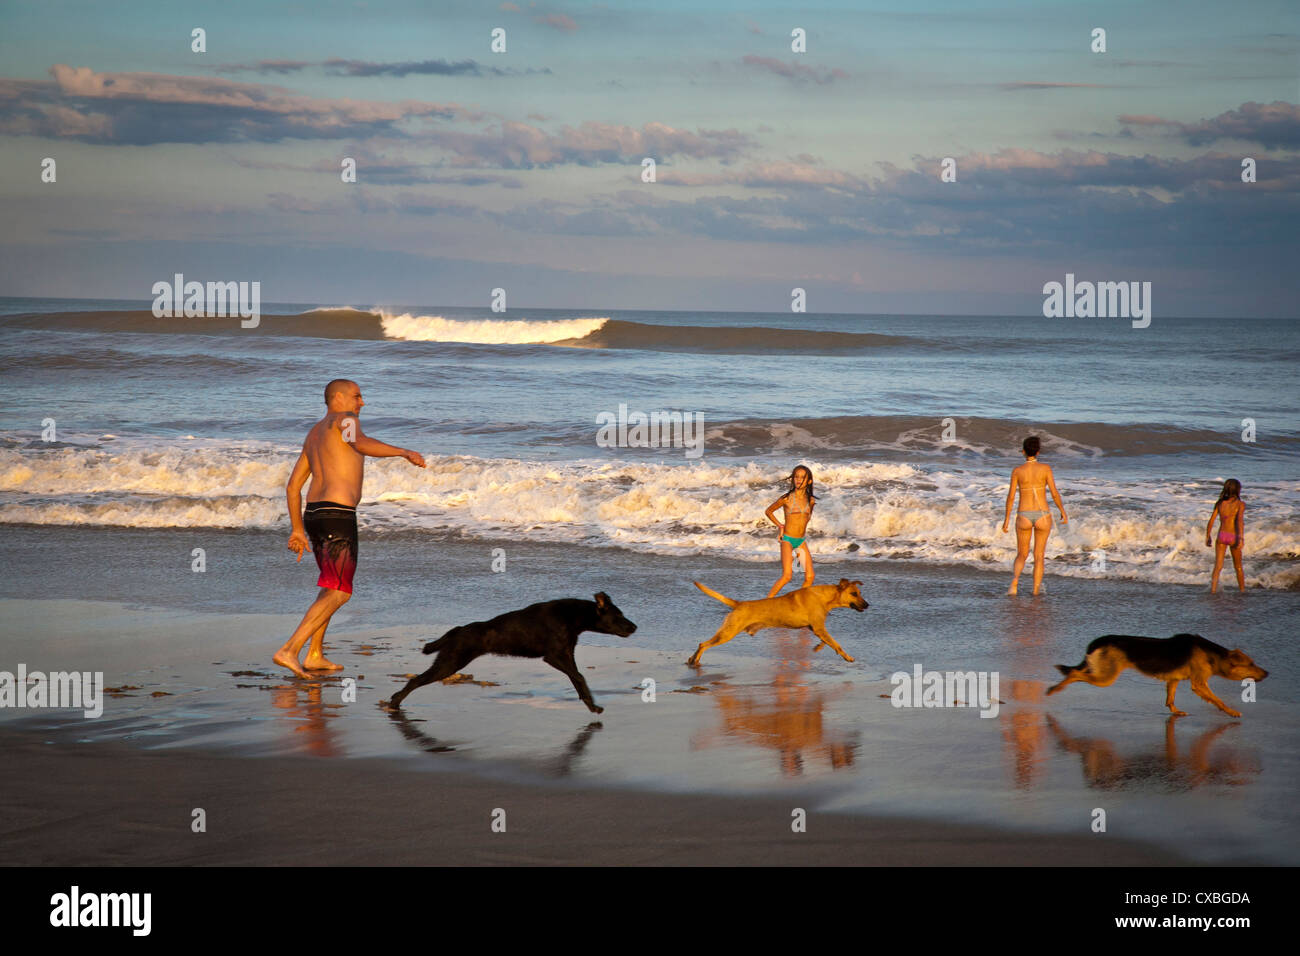 Beach, Mar de las Pampas, Argentina. Stock Photo